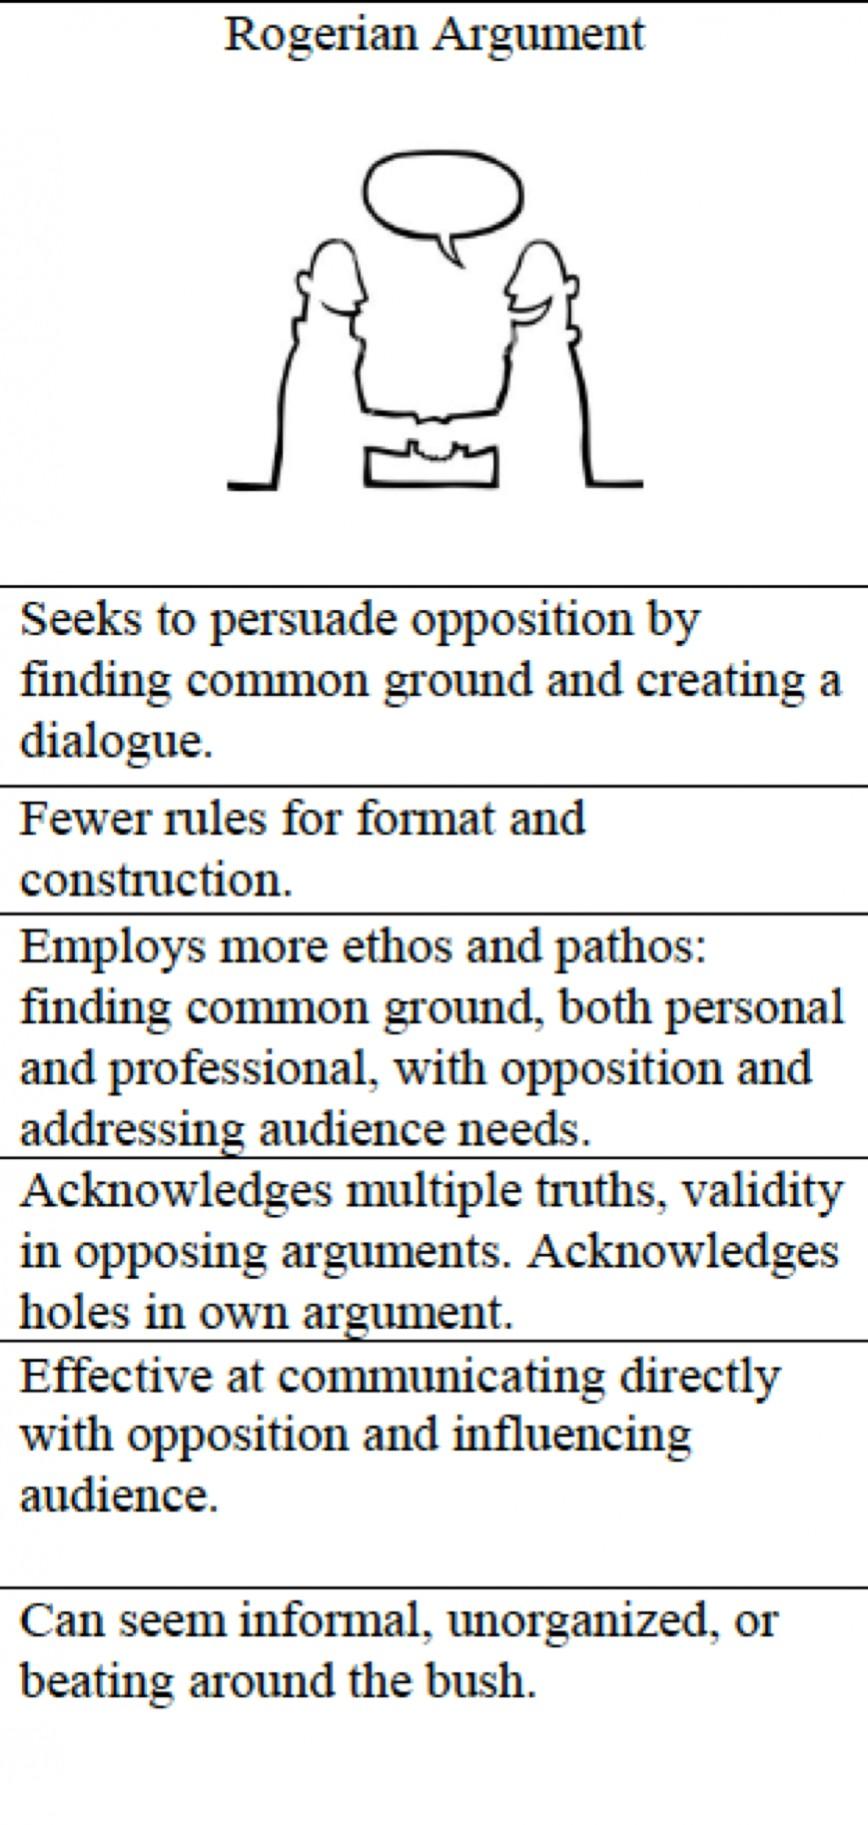 015 Essay Example Best Rogerian Argument Sentence Abortion Style Topics 868